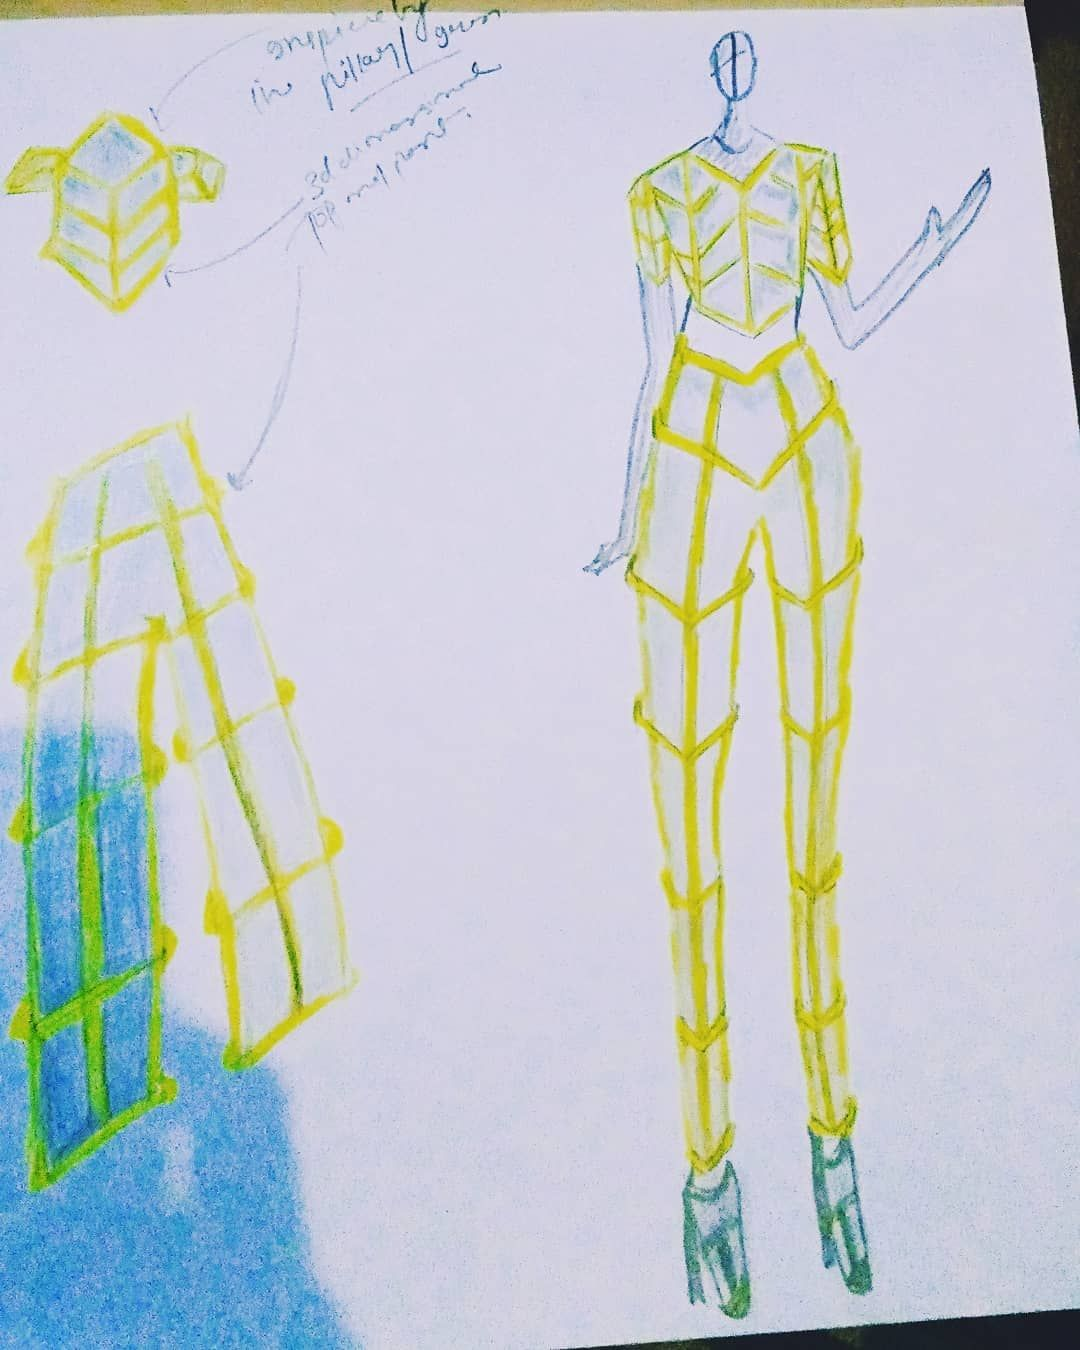 Watch The Best Youtube Videos Online Fashionillustration Fashion Illustration Art Drawing Sketch Artist Fashiond Illustration Video Online Art Videos